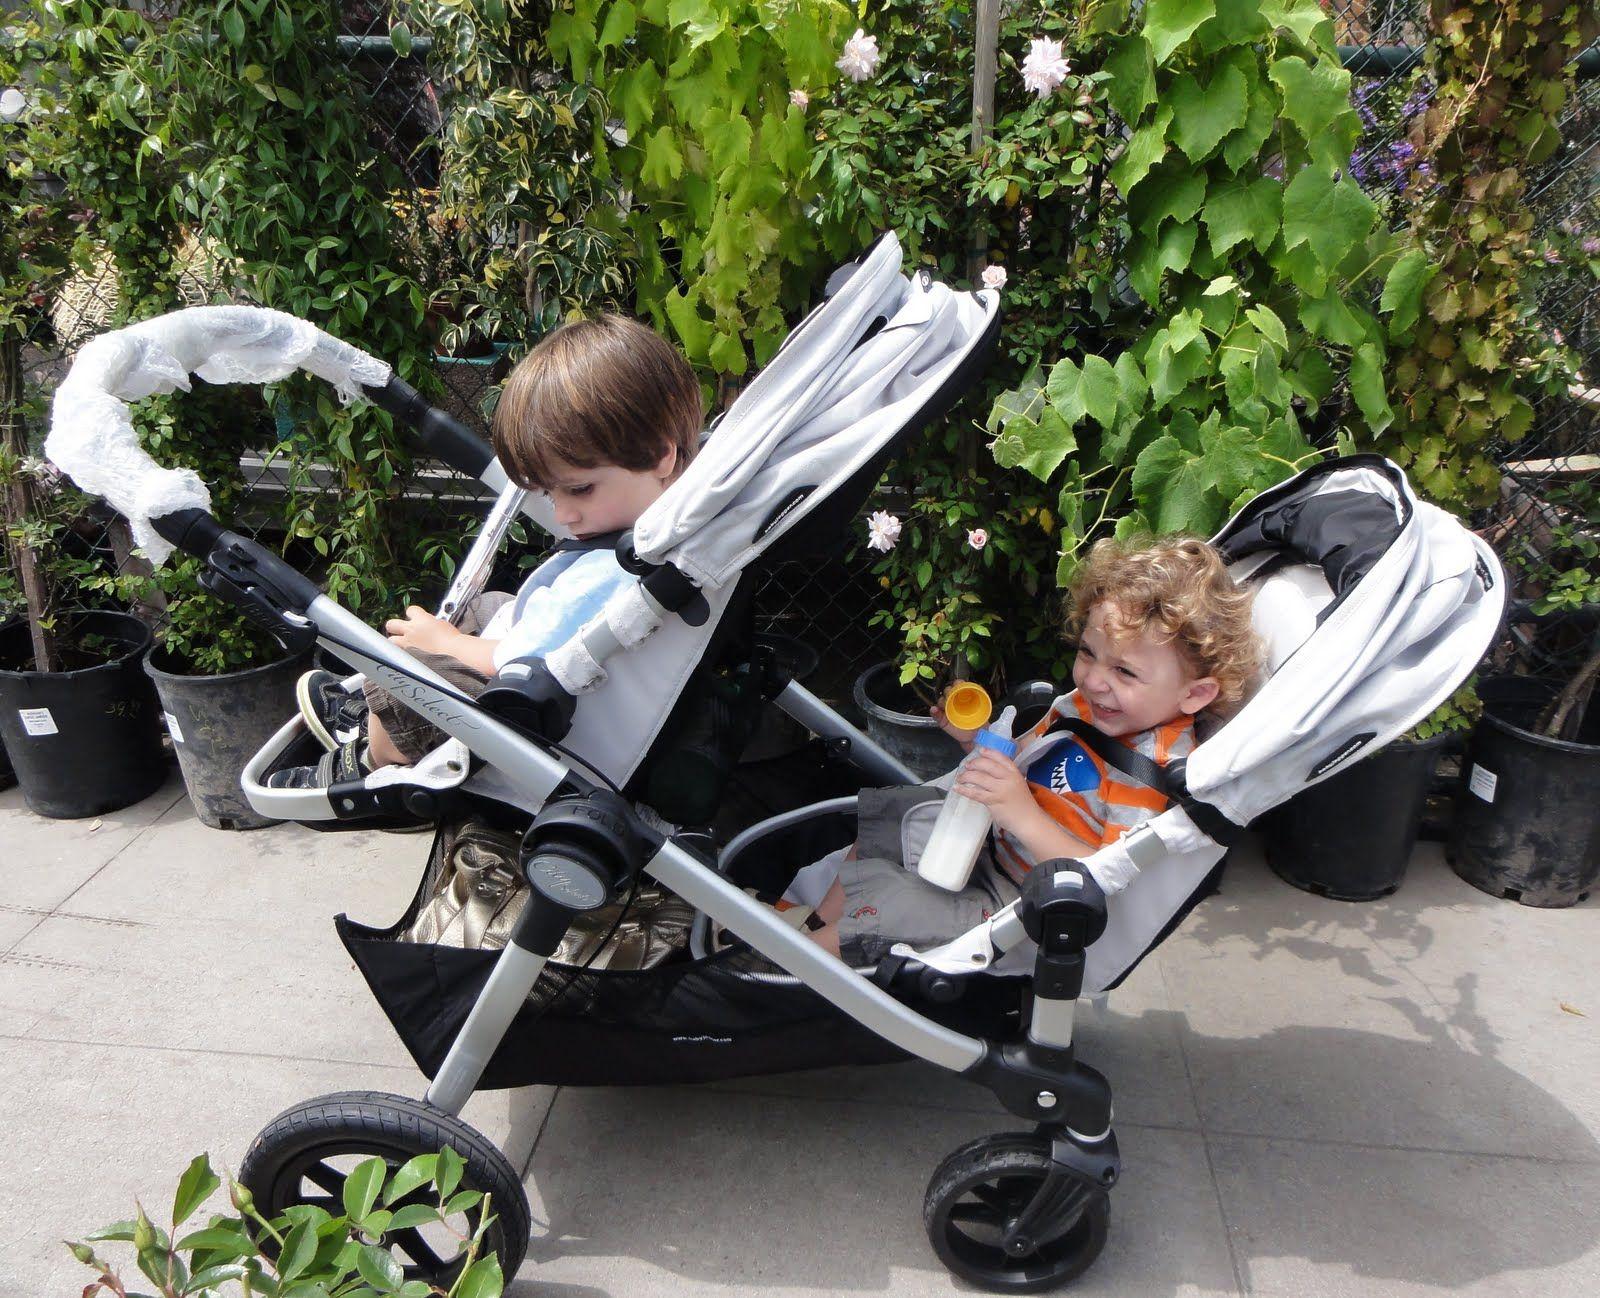 Baby Jogger City Select Stroller Review Kinderwagen Kinder Wagen Baby Jogger